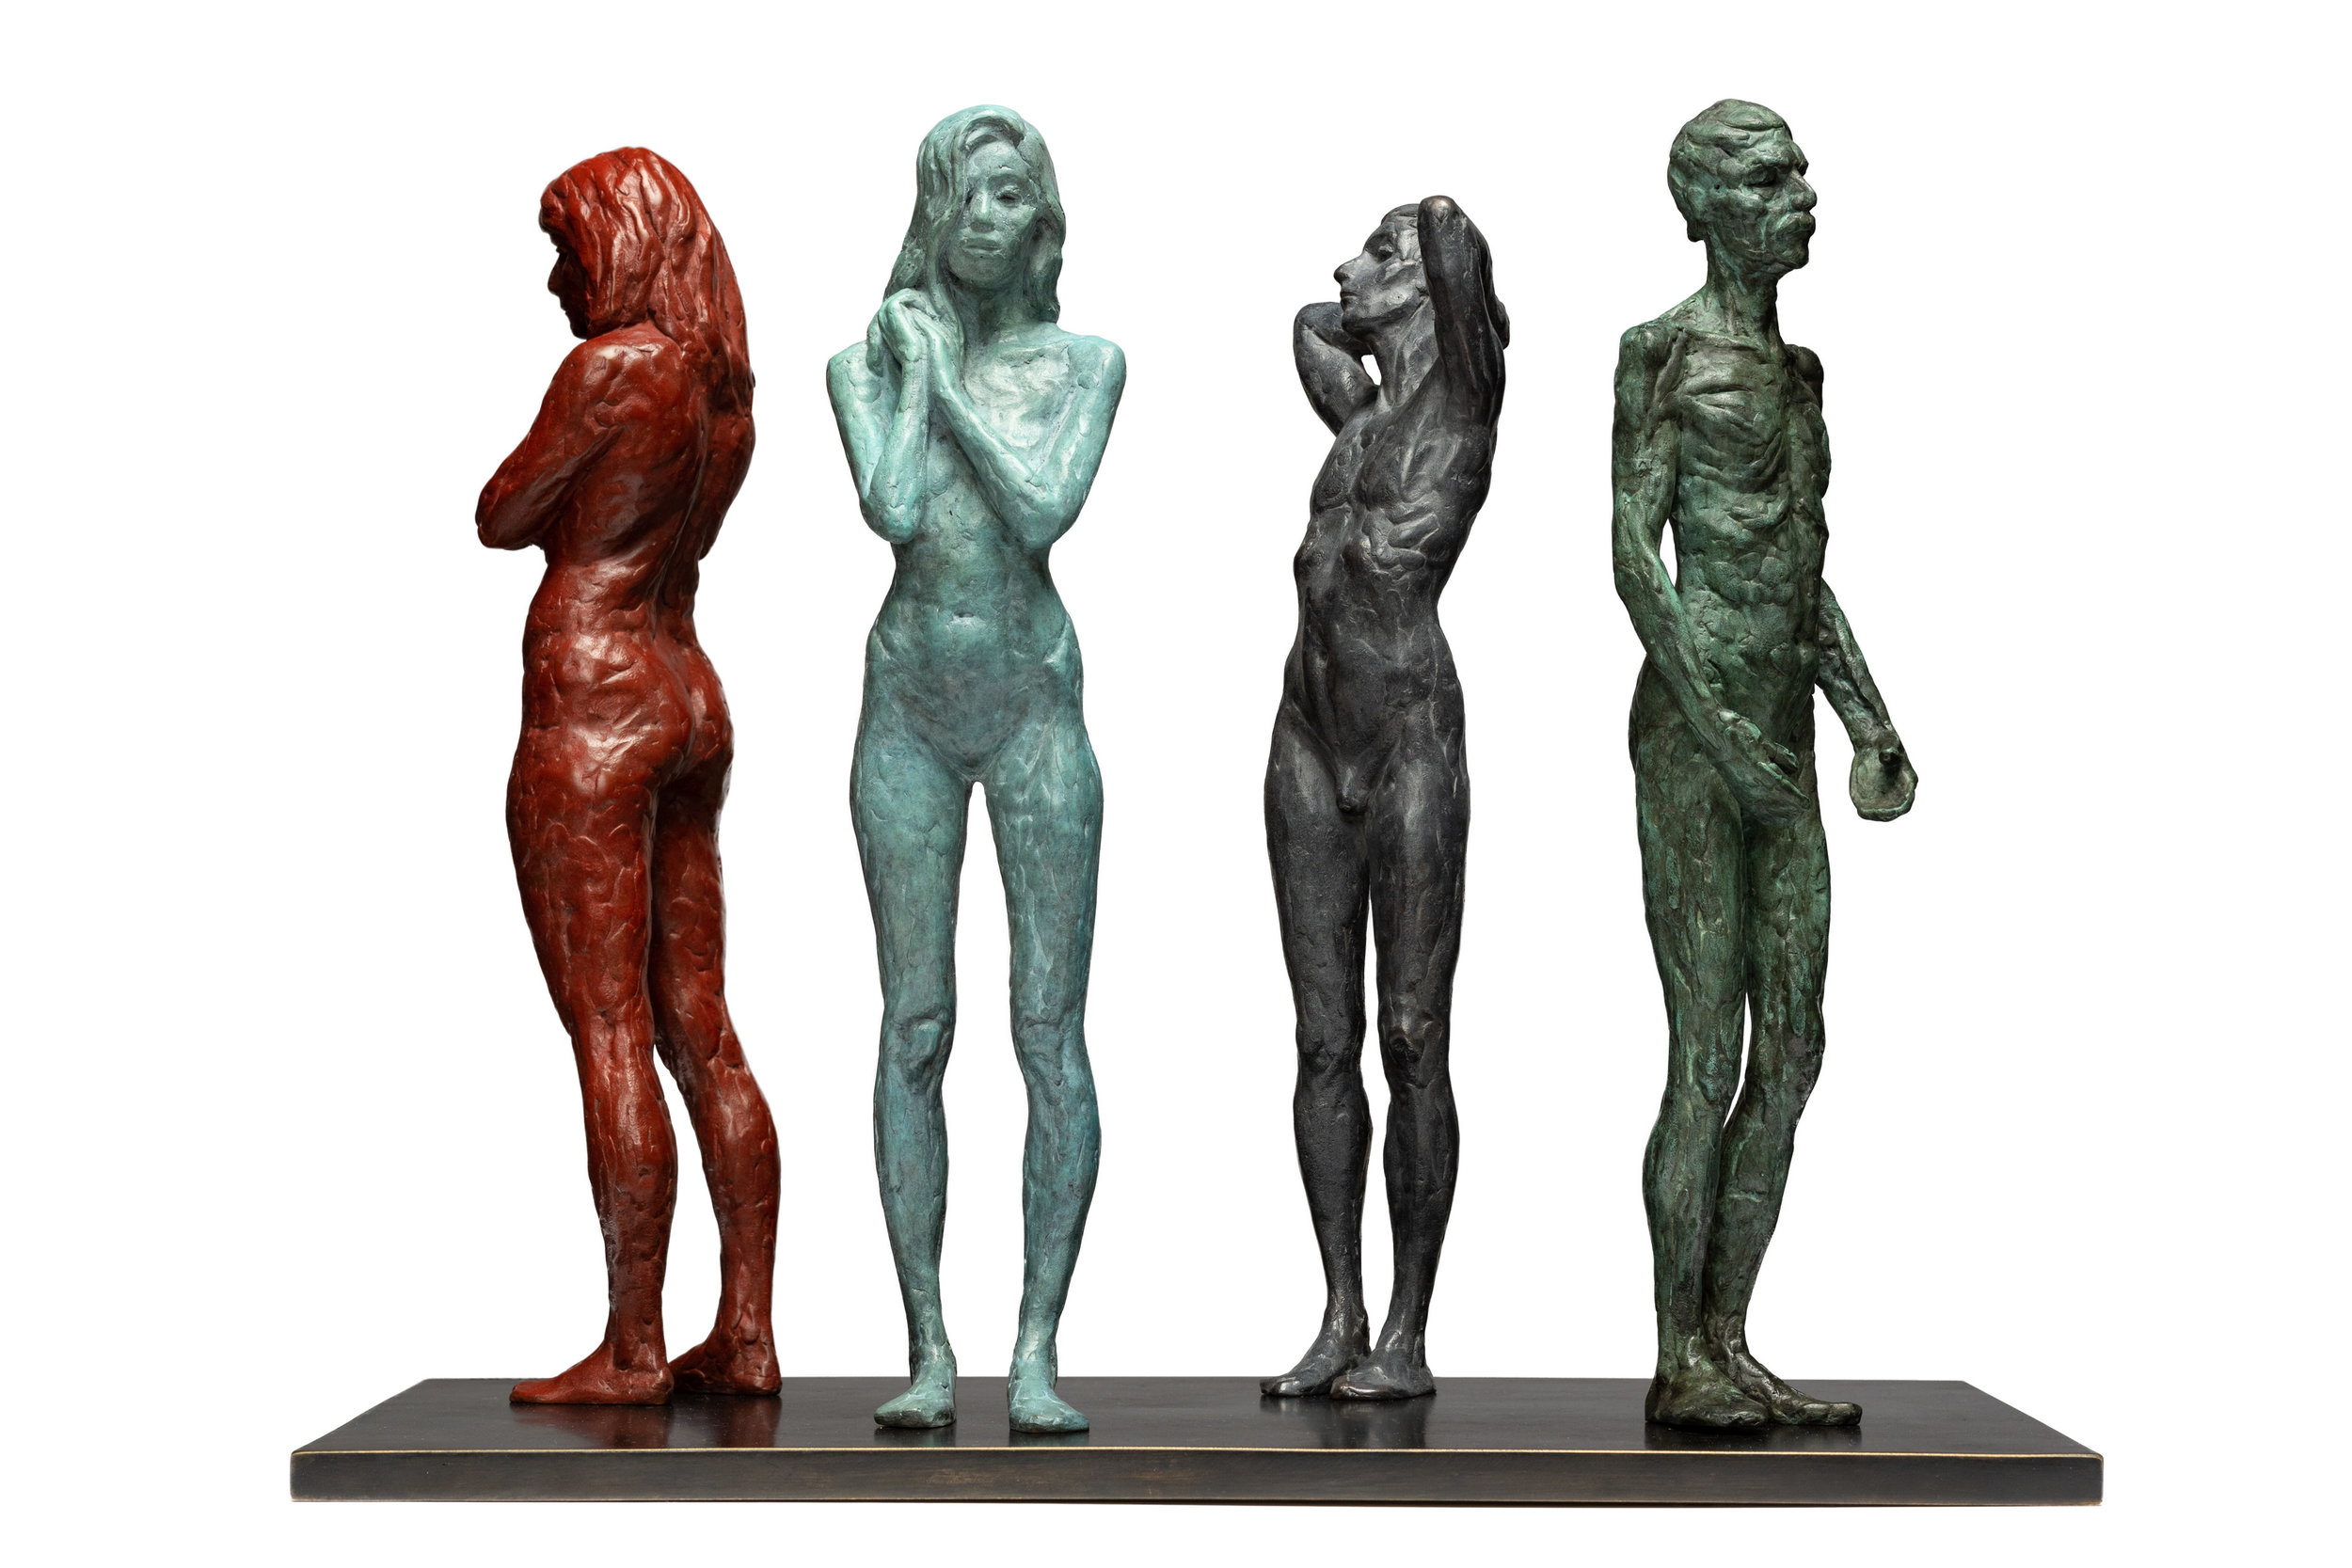 mf-figure-group-bronze-004.jpg